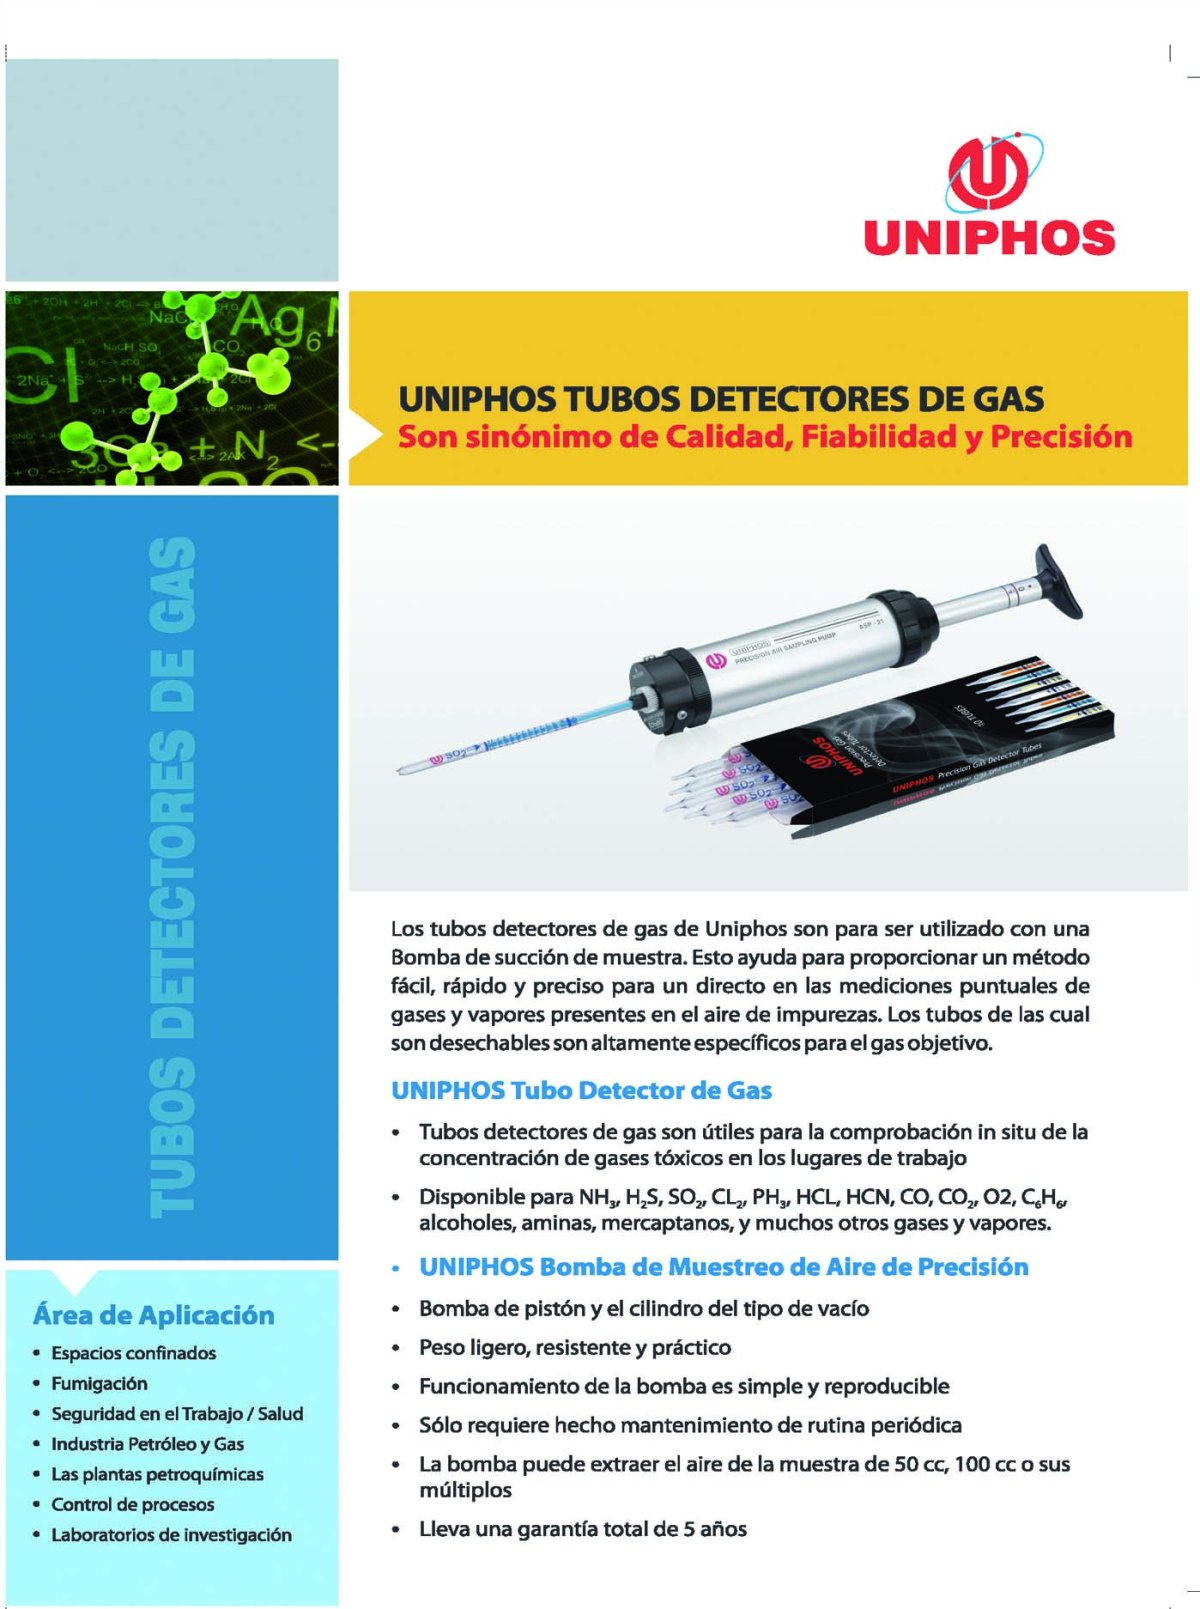 Uniphos-Gas-Detector-Tubes_Spanish